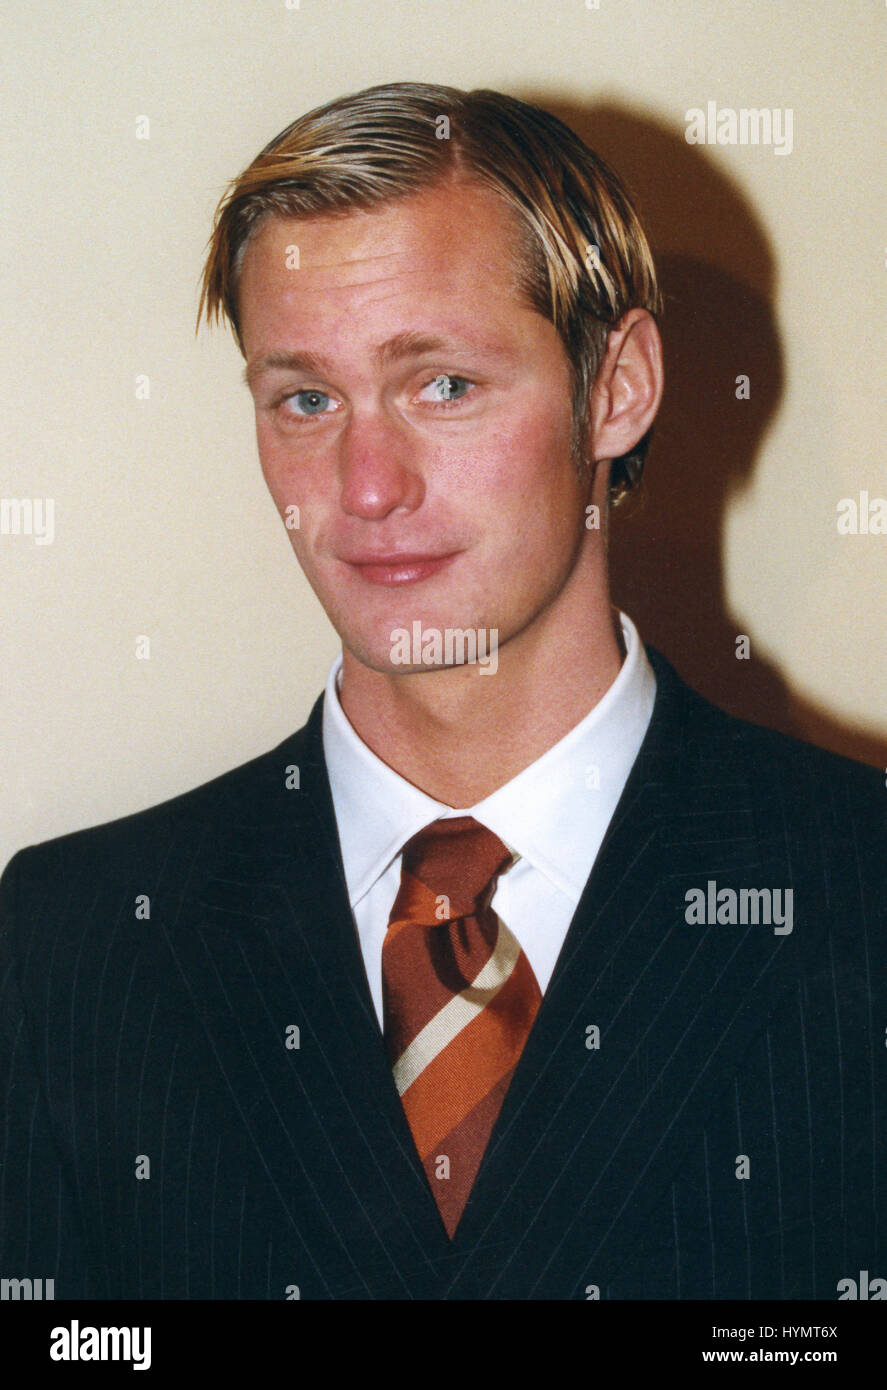 ALEXANDER SKARSGÅRD actor and son to the Swedish actor Stellan Skarsgård 2016 - Stock Image